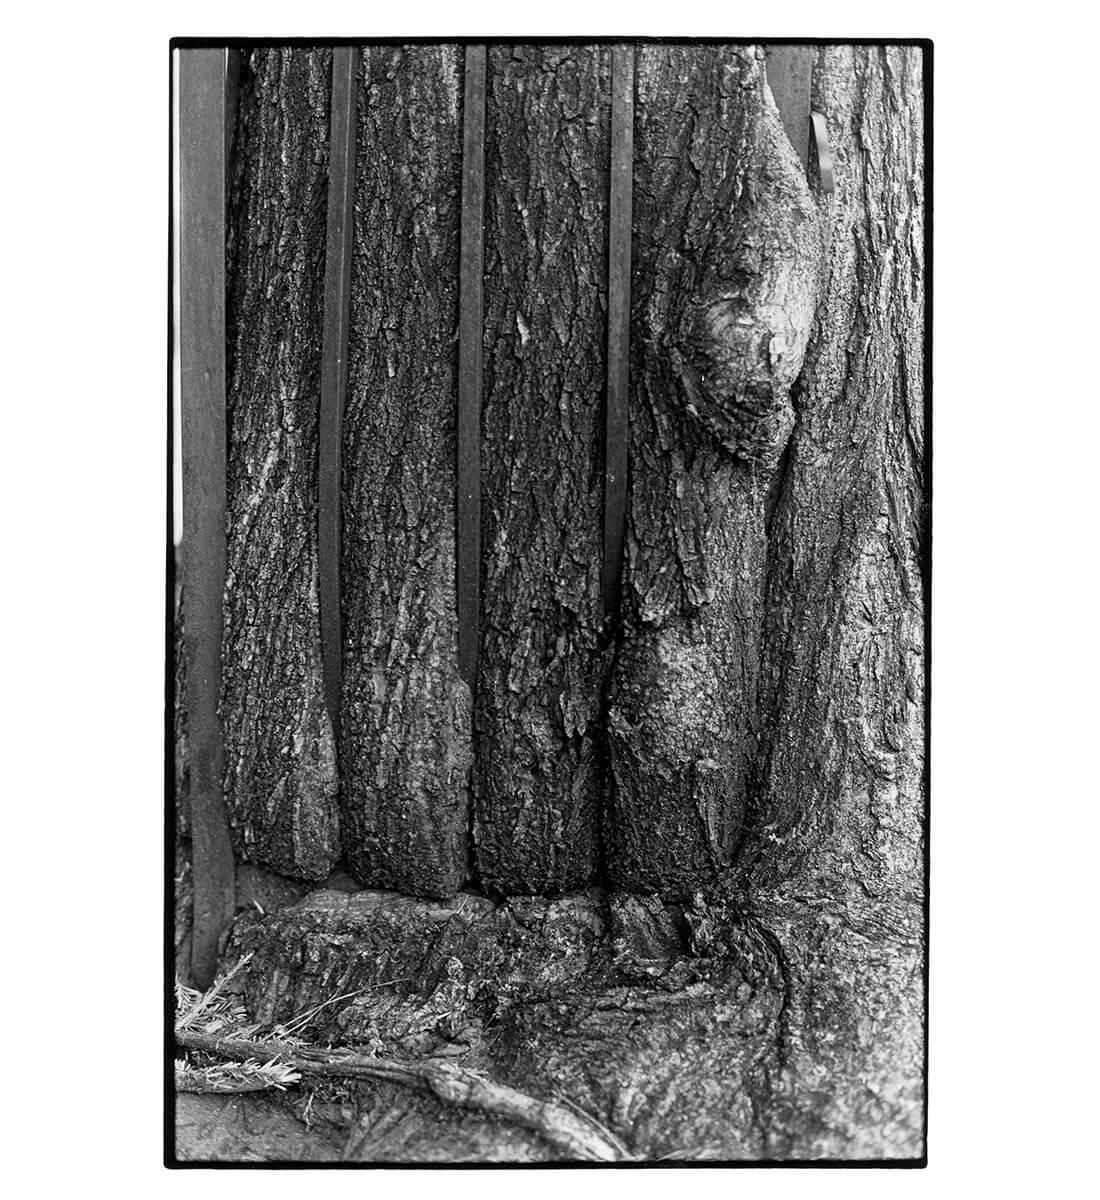 Tree + Fence, E. 6th St. (close-up)